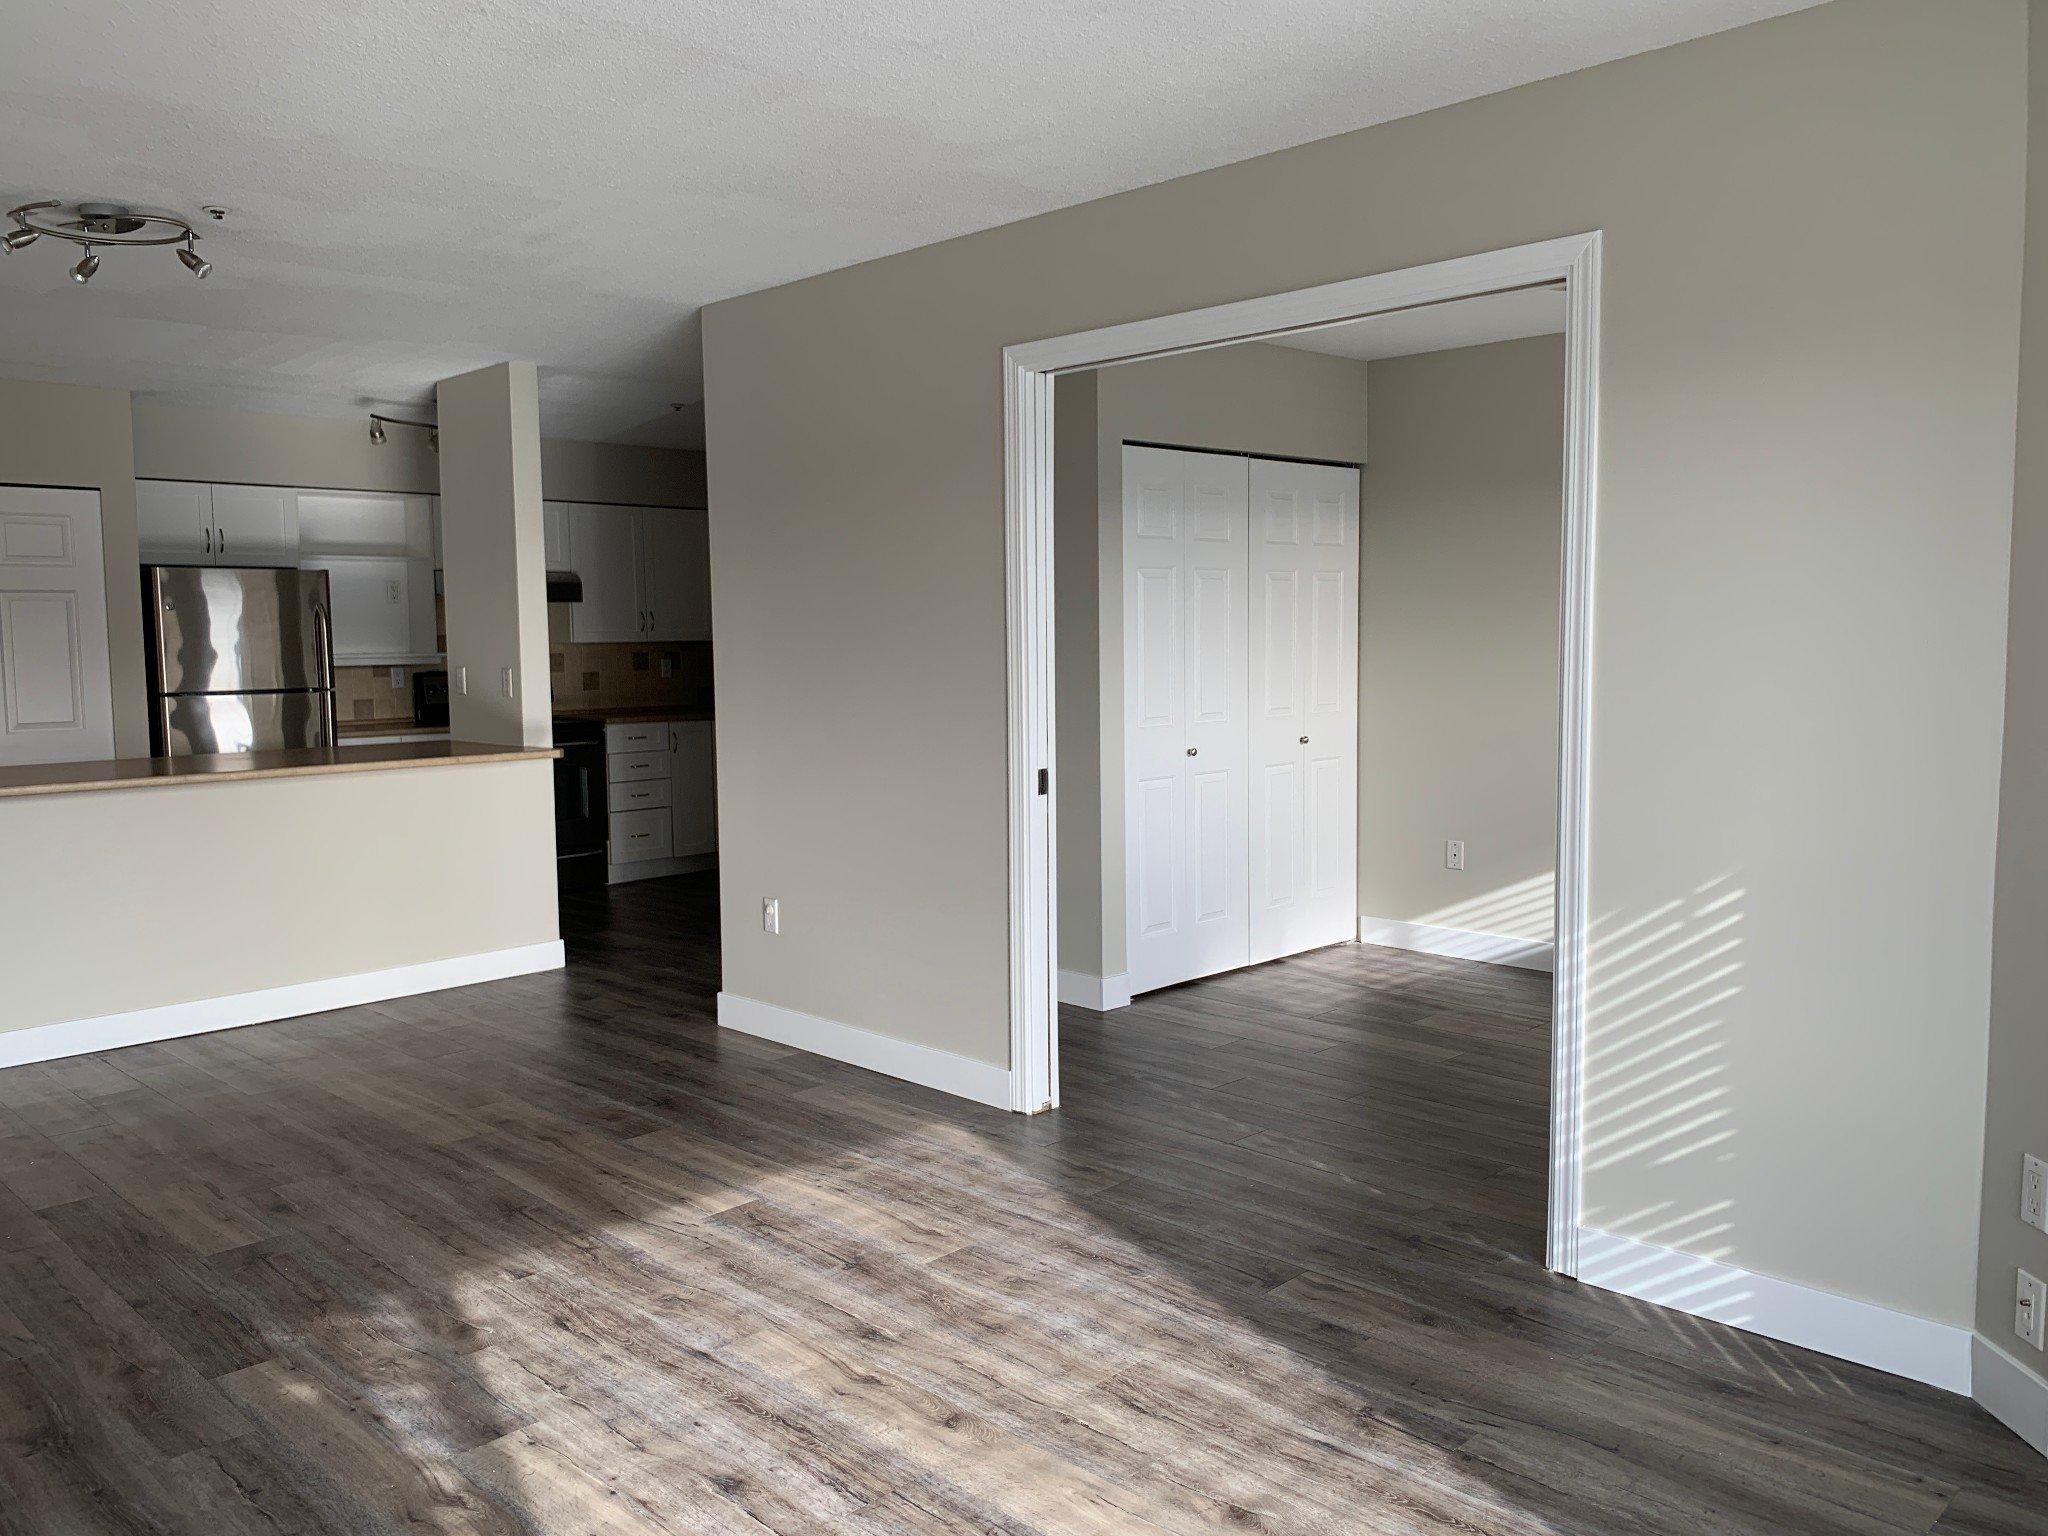 Photo 7: Photos: #510 2700 McCallum Rd. in Abbotsford: Central Abbotsford Condo for rent